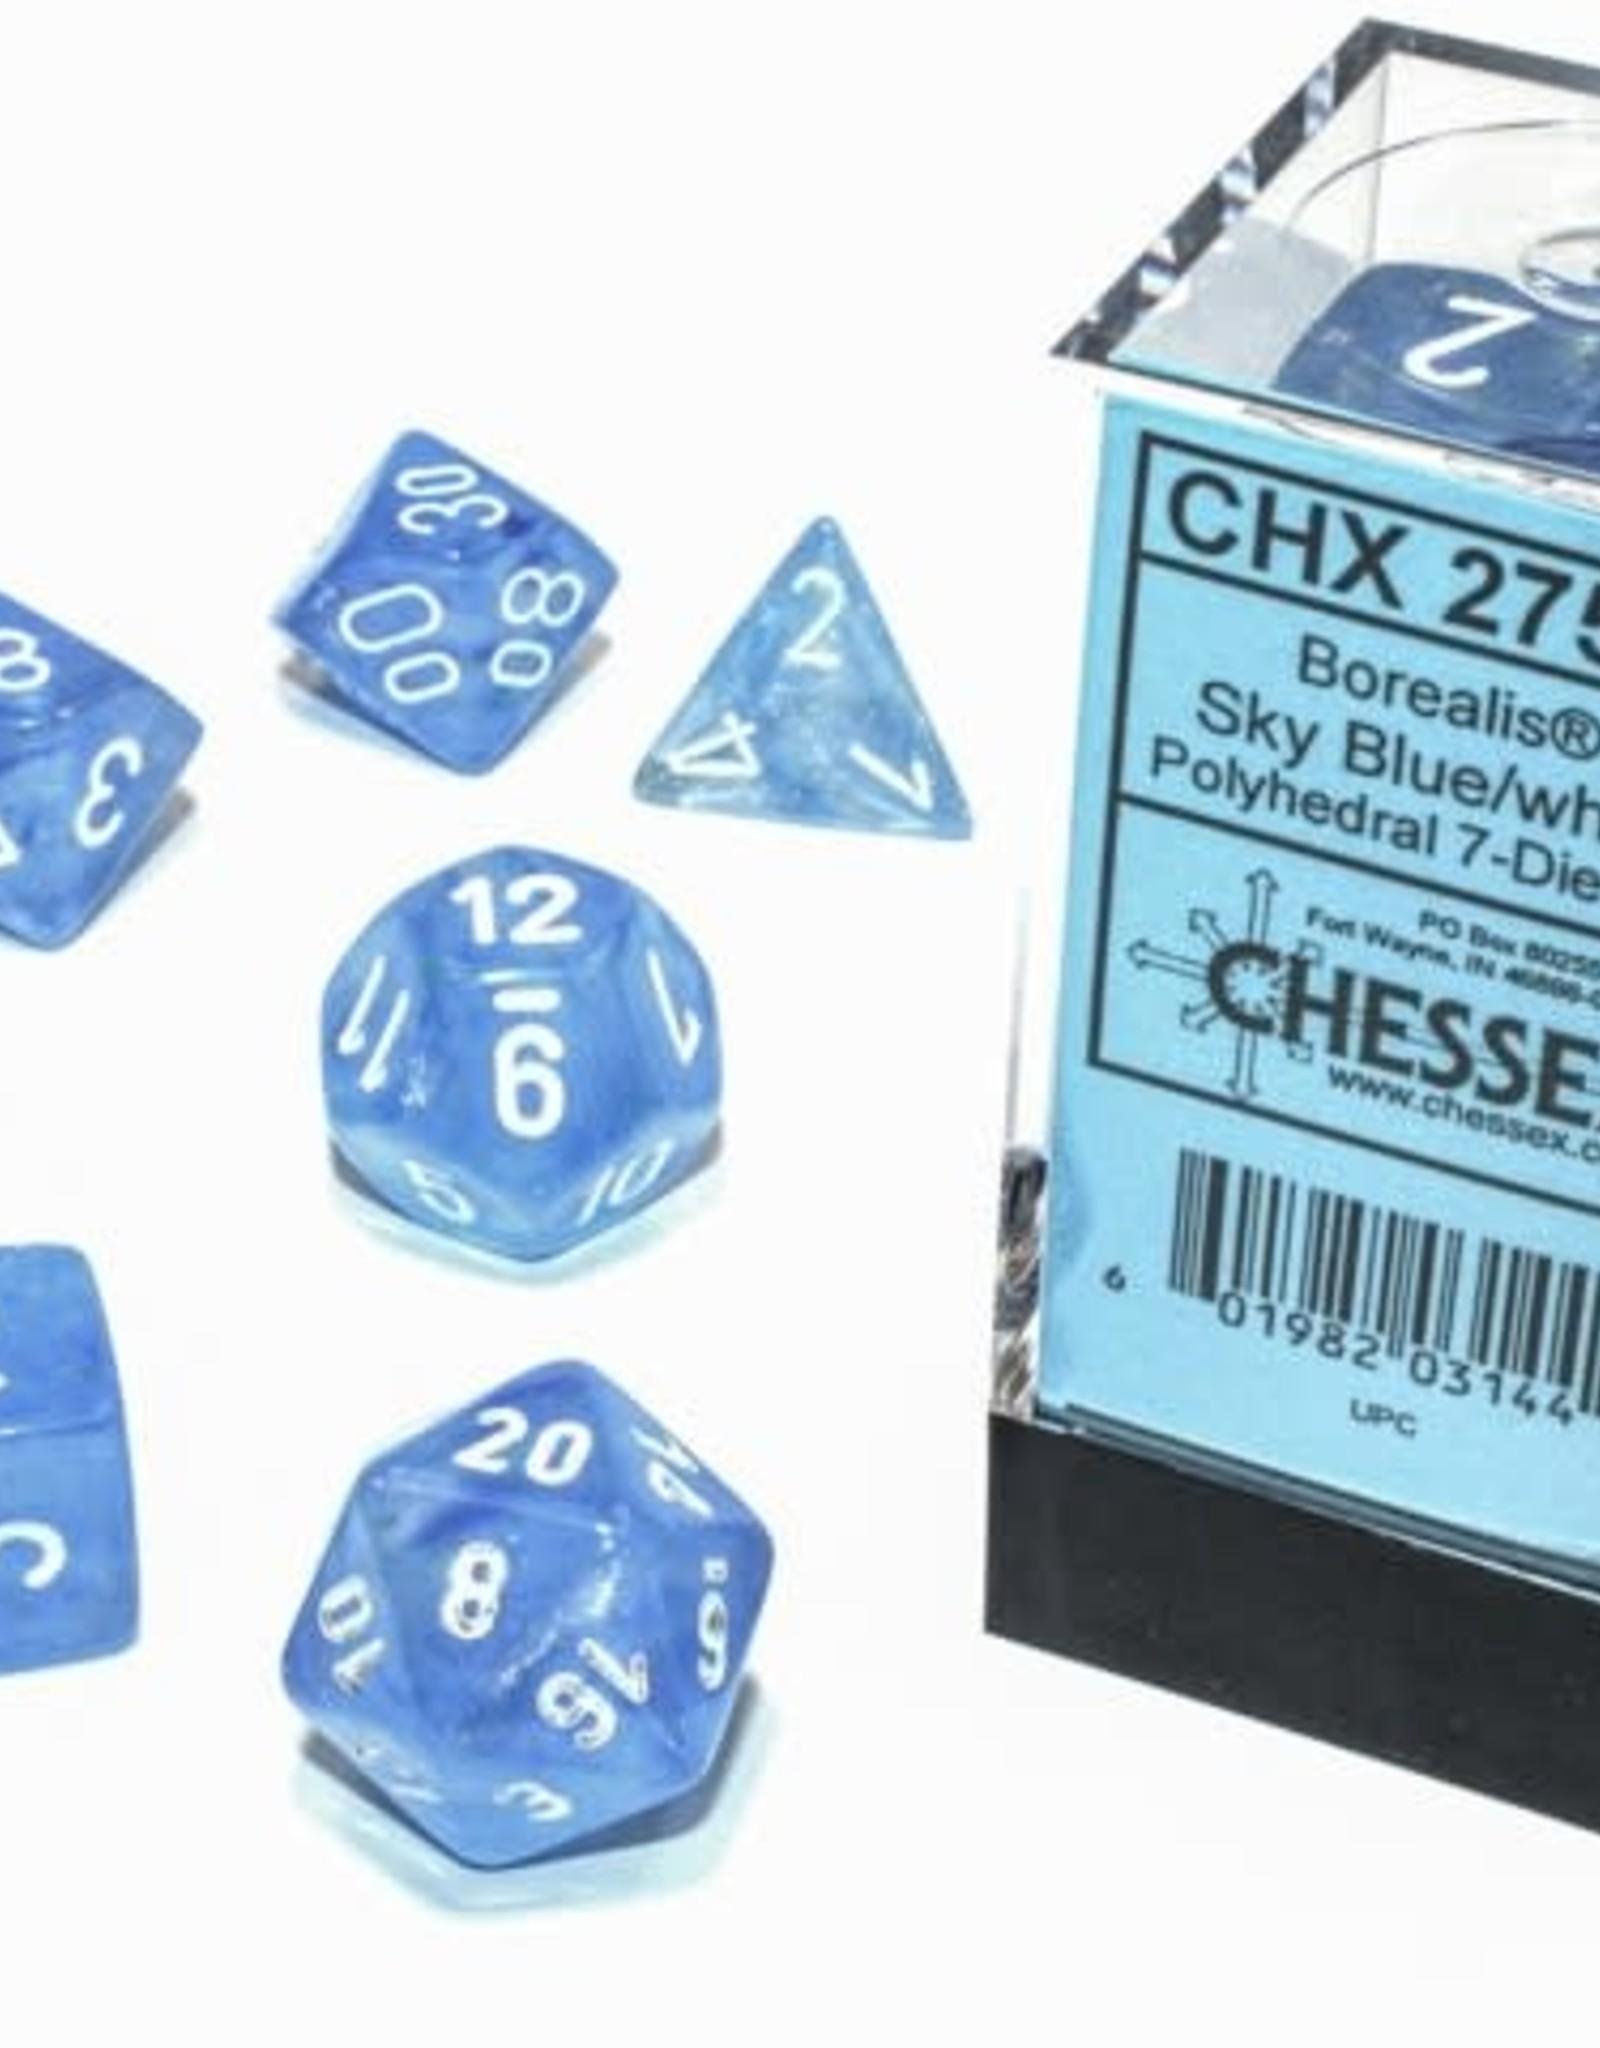 Chessex Borealis Luminary Poly 7 set: Sky Blue w/ White